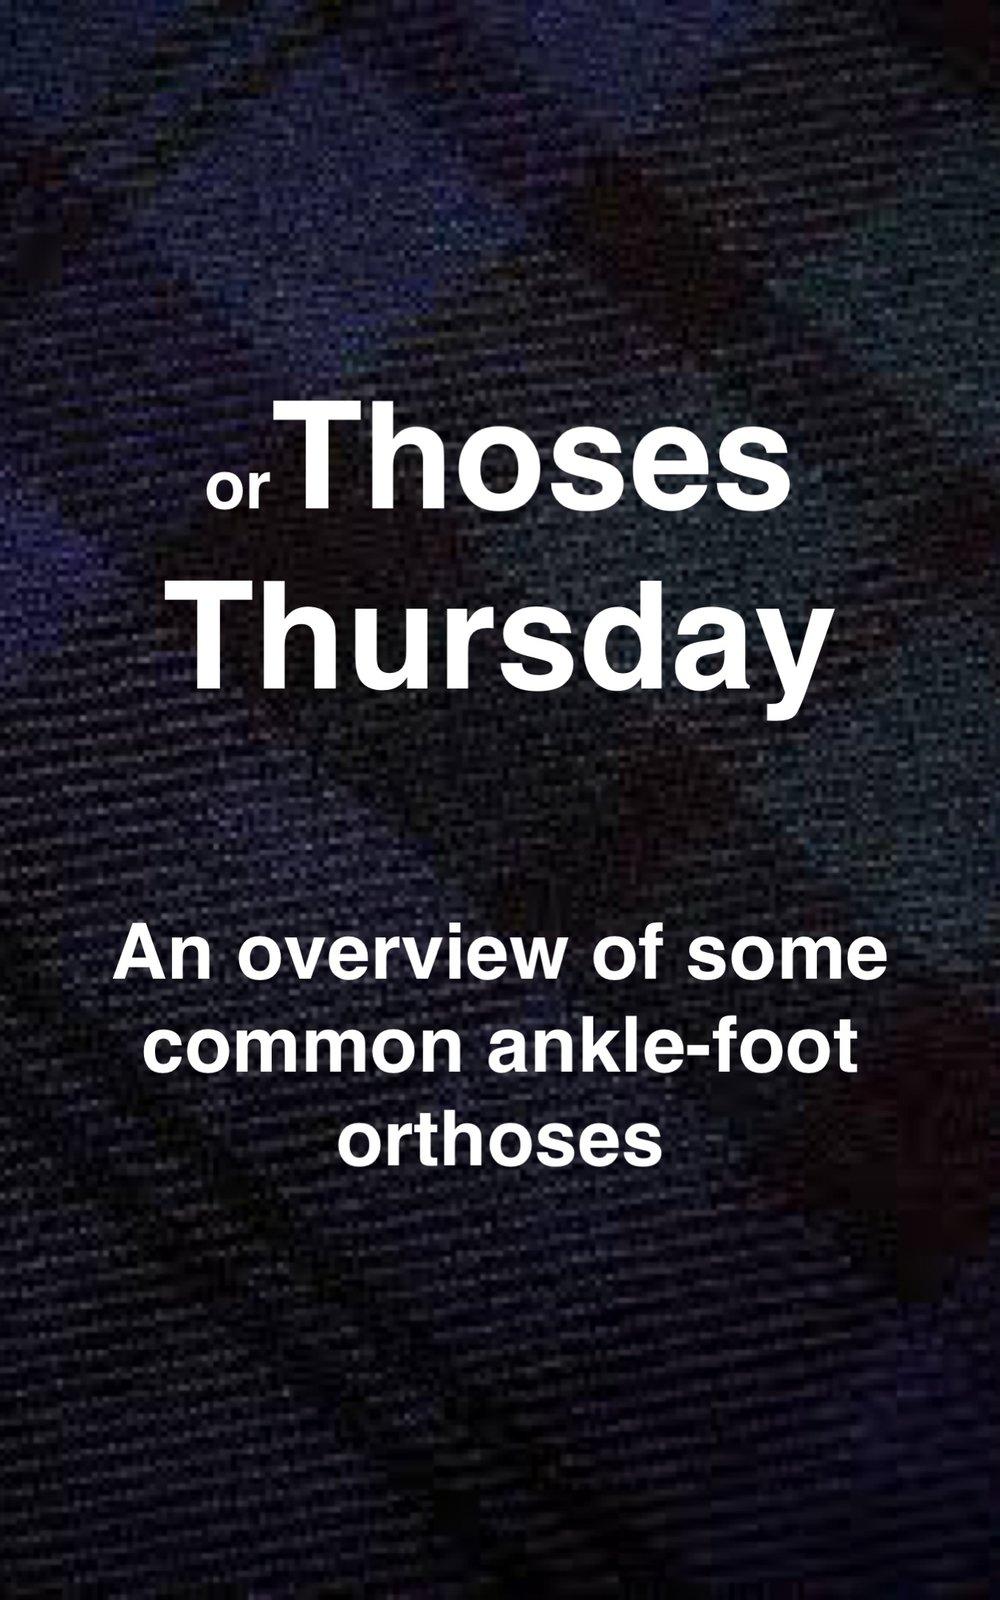 Orthoses01.jpg